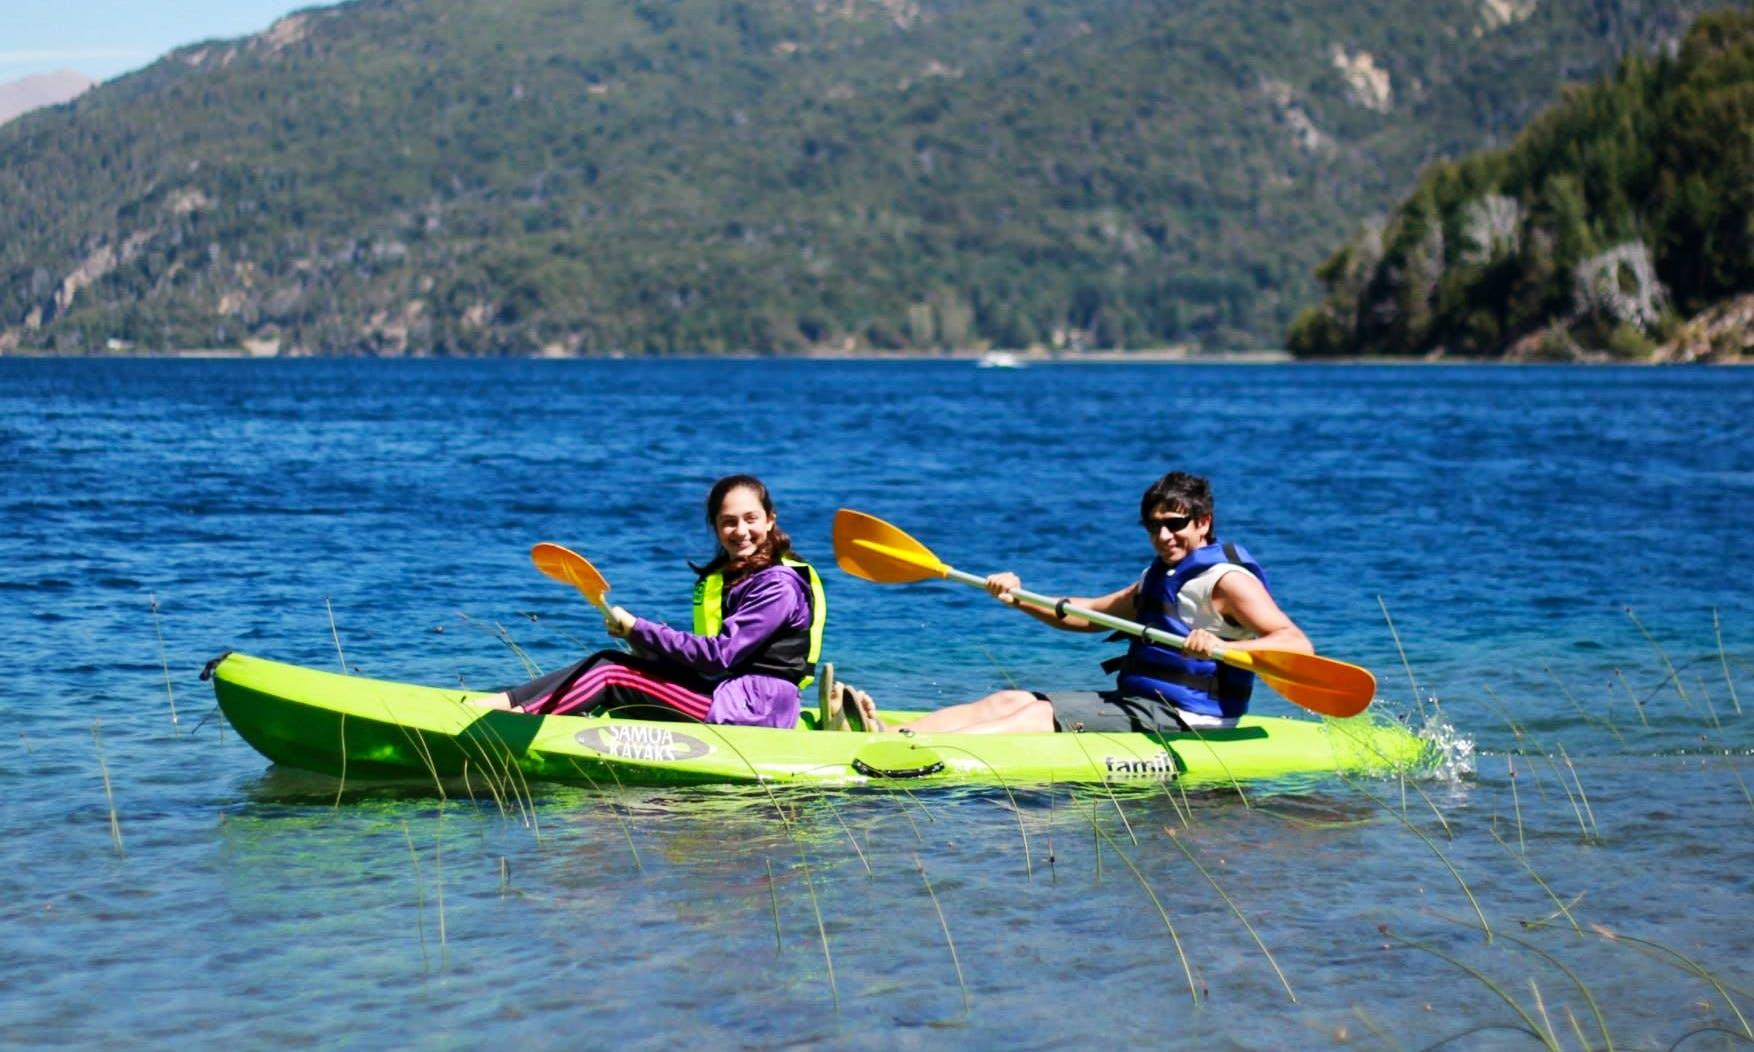 Double-Kayak Rental & Trips in Villa Rosa, Argentina